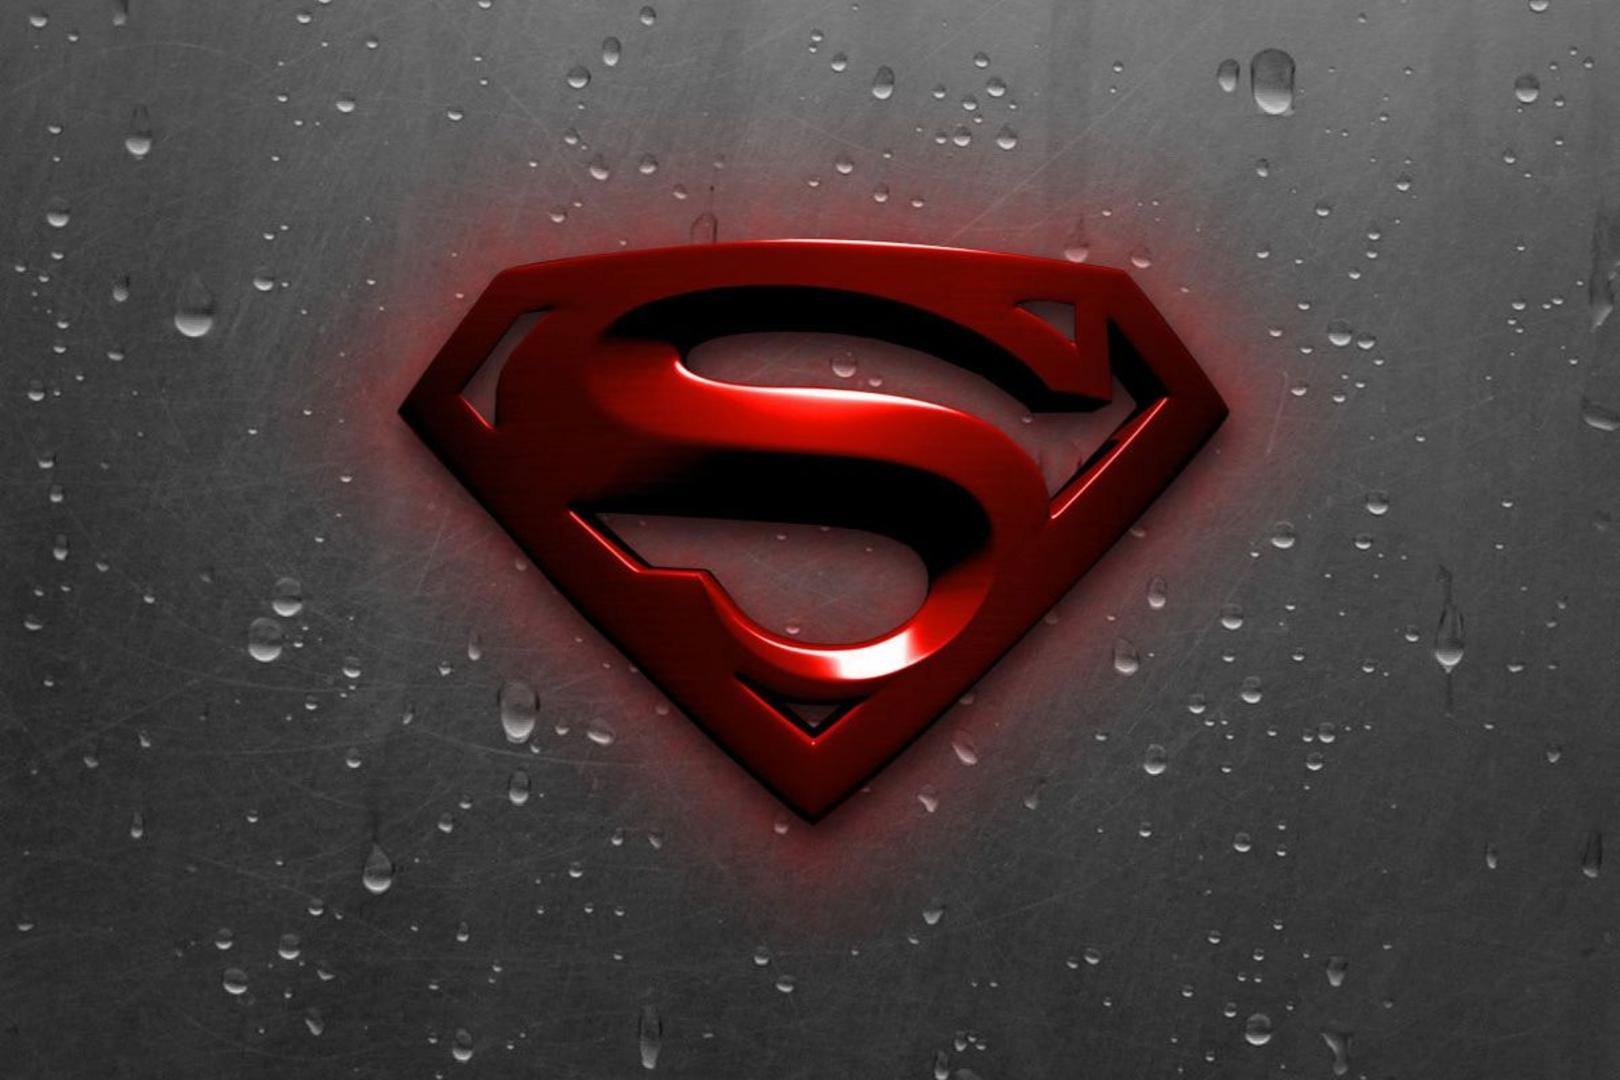 Superman wallpaper hd 1920x1080 wallpapersafari wallpapers for superman logo wallpaper hd 1920x1080 1620x1080 voltagebd Choice Image